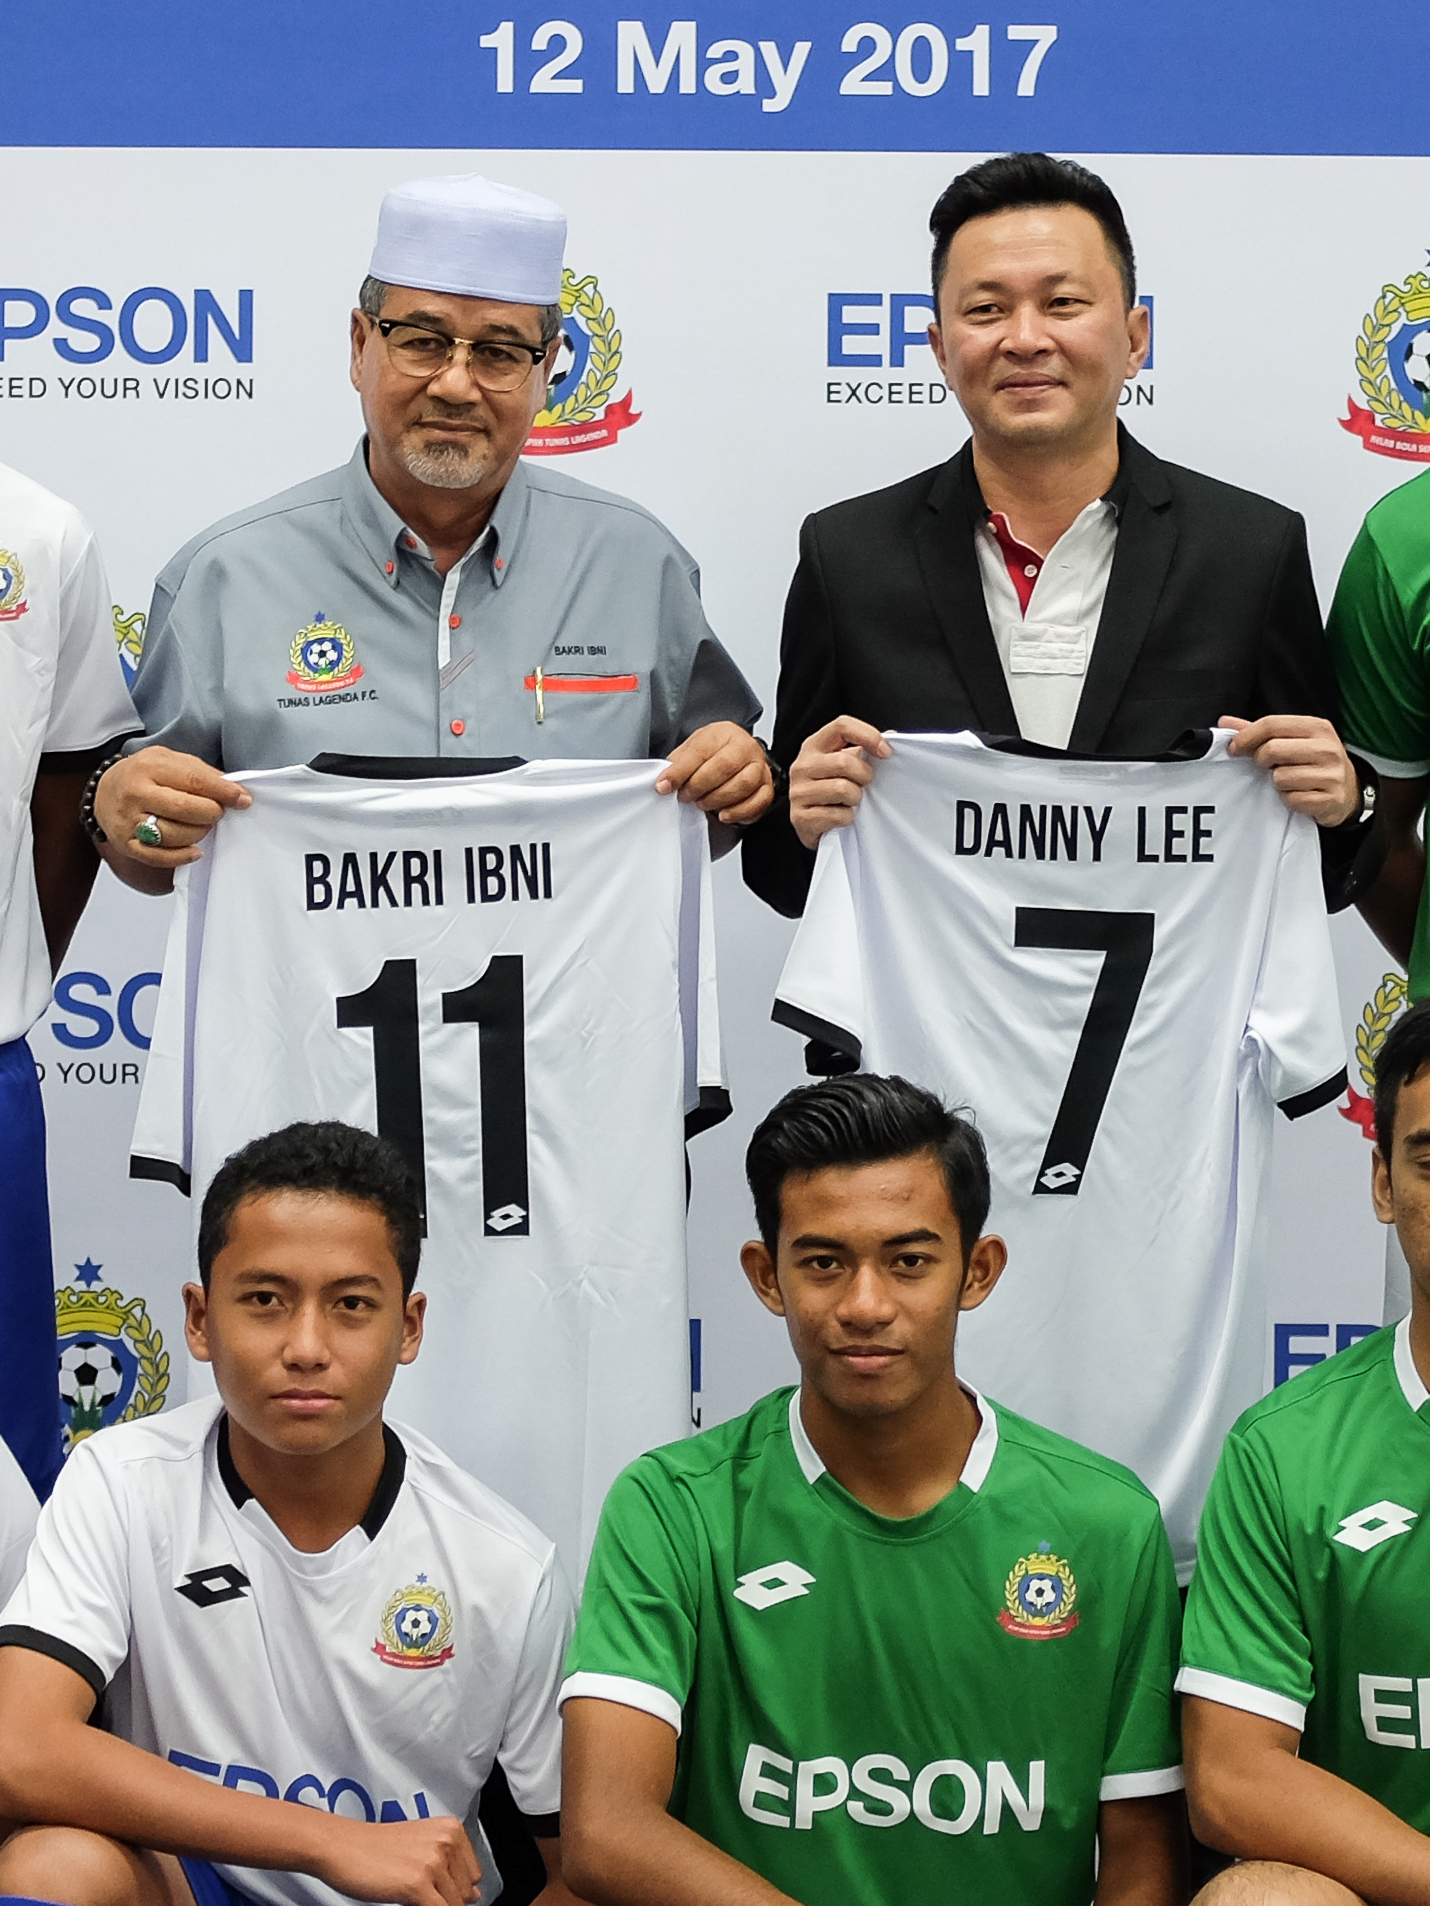 Epson Malaysia signs sponsorship agreement with Tunas Lagenda Football Club